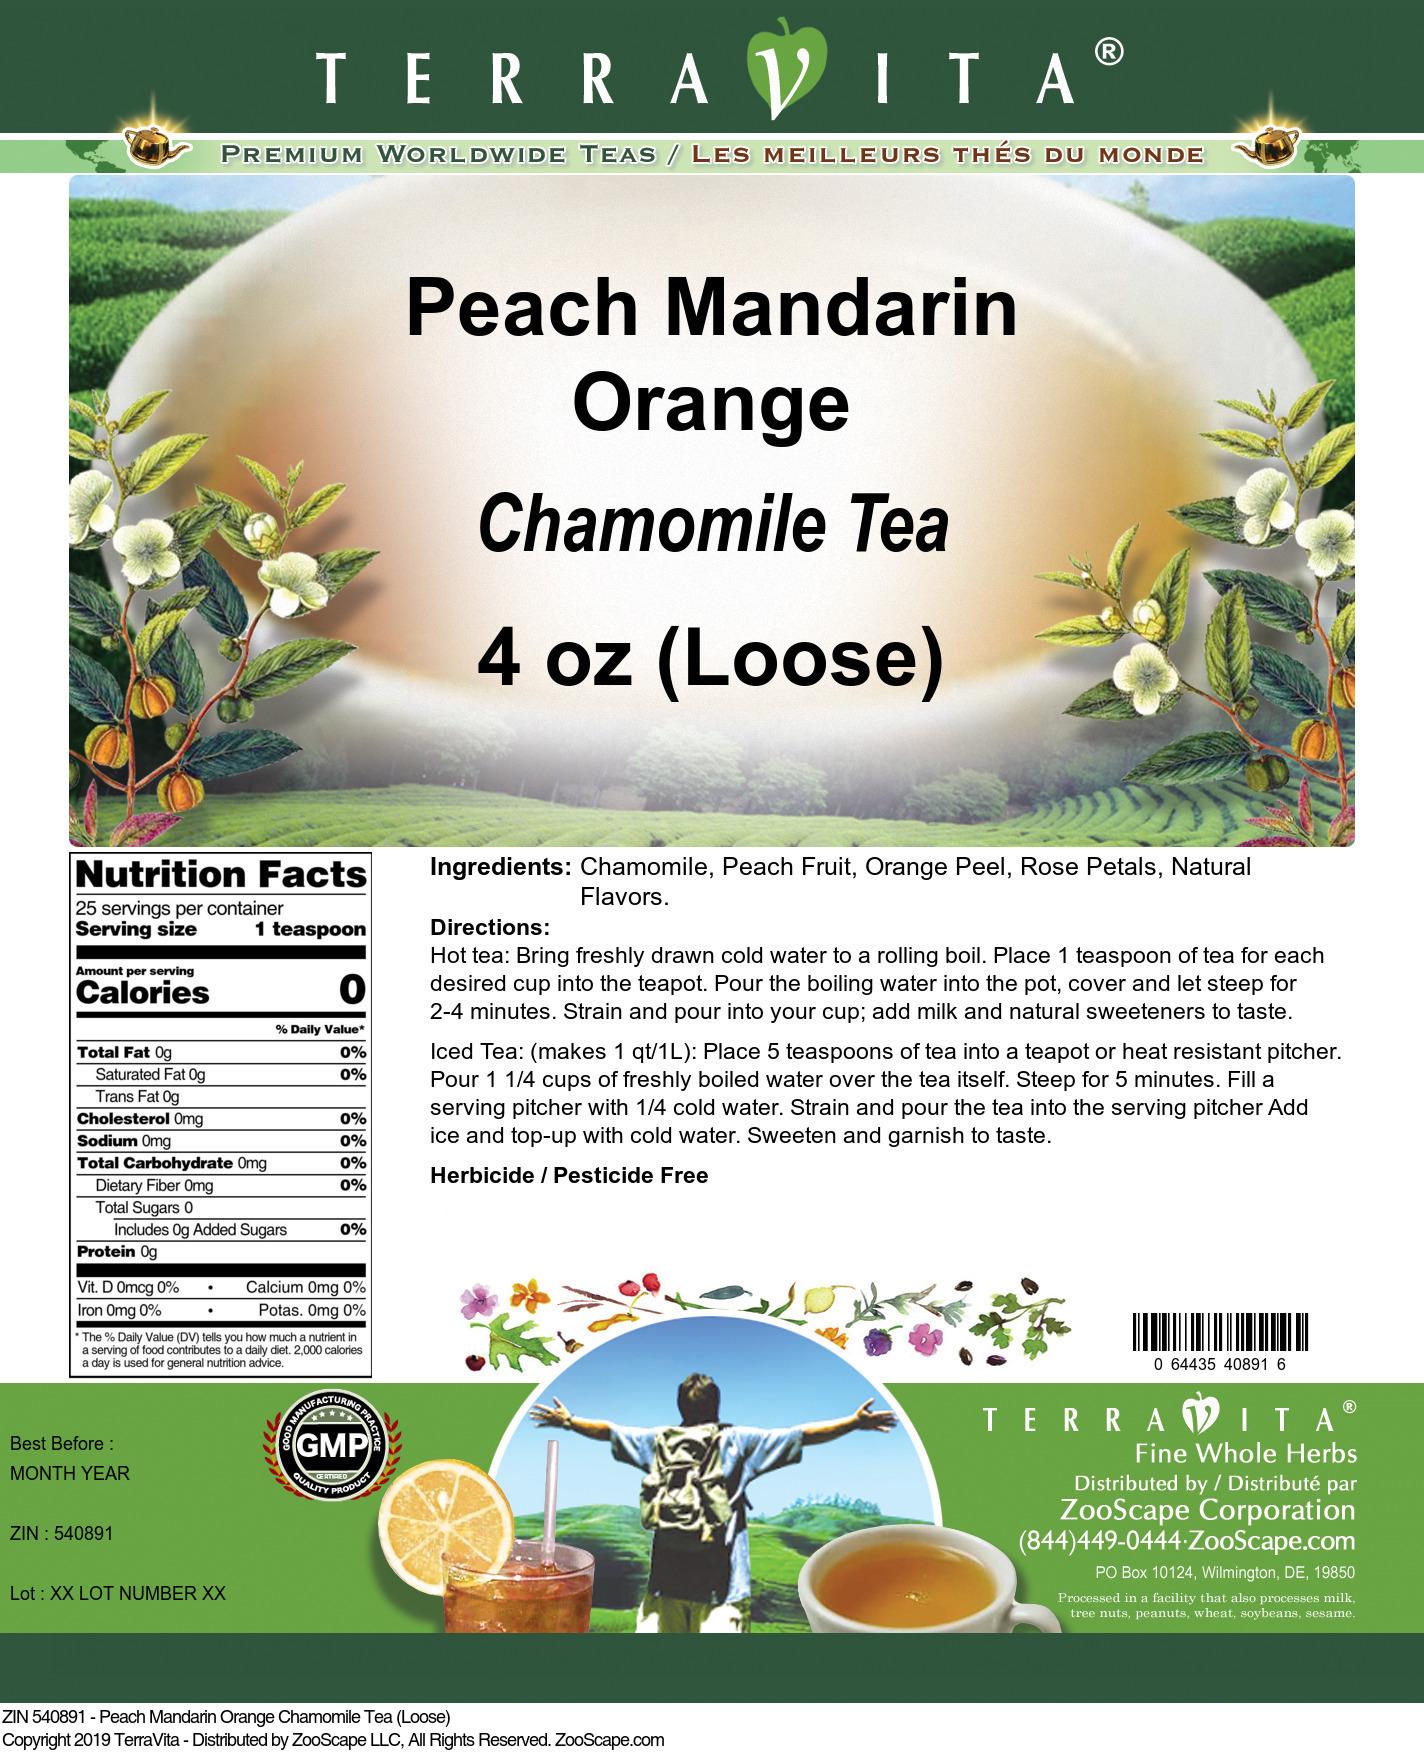 Peach Mandarin Orange Chamomile Tea (Loose)